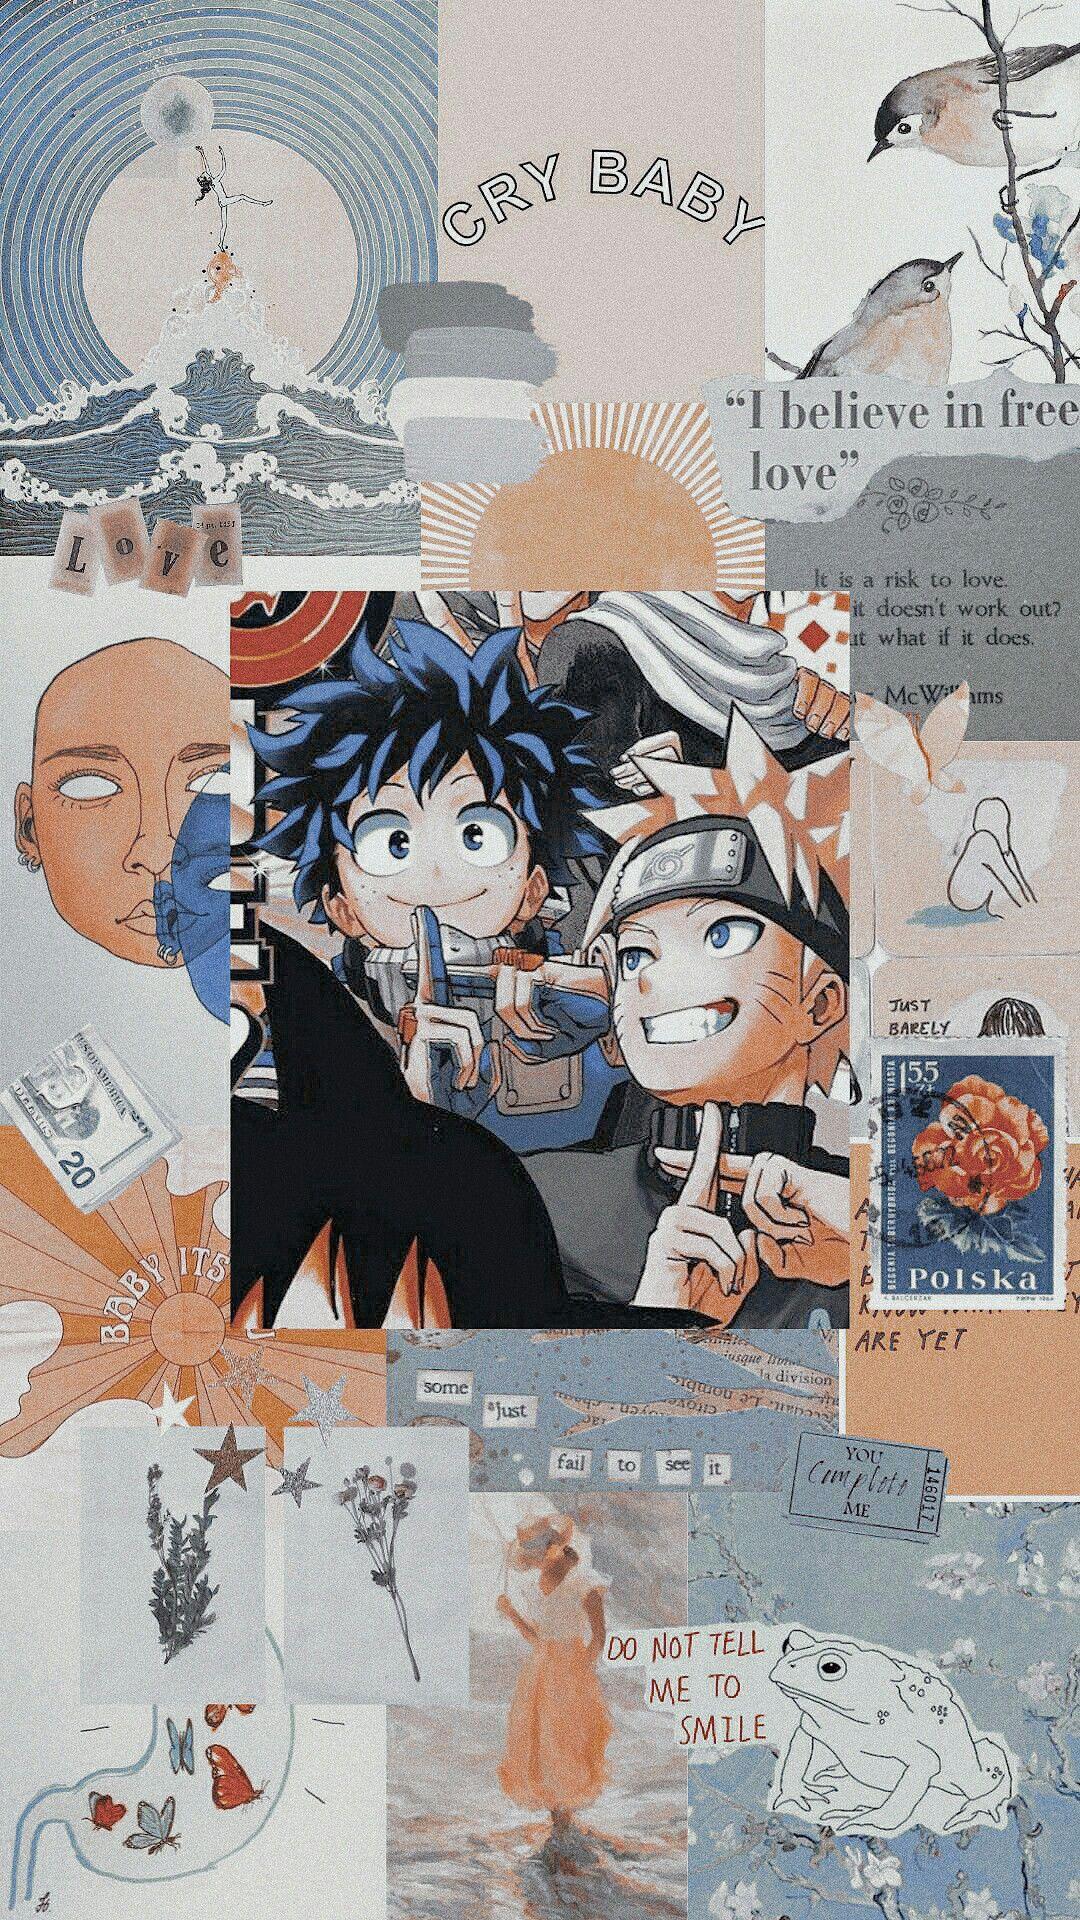 Deku And Naruto Anime Wallpaper Aesthetic Anime Naruto Wallpaper Aesthetic anime wallpaper iphone naruto